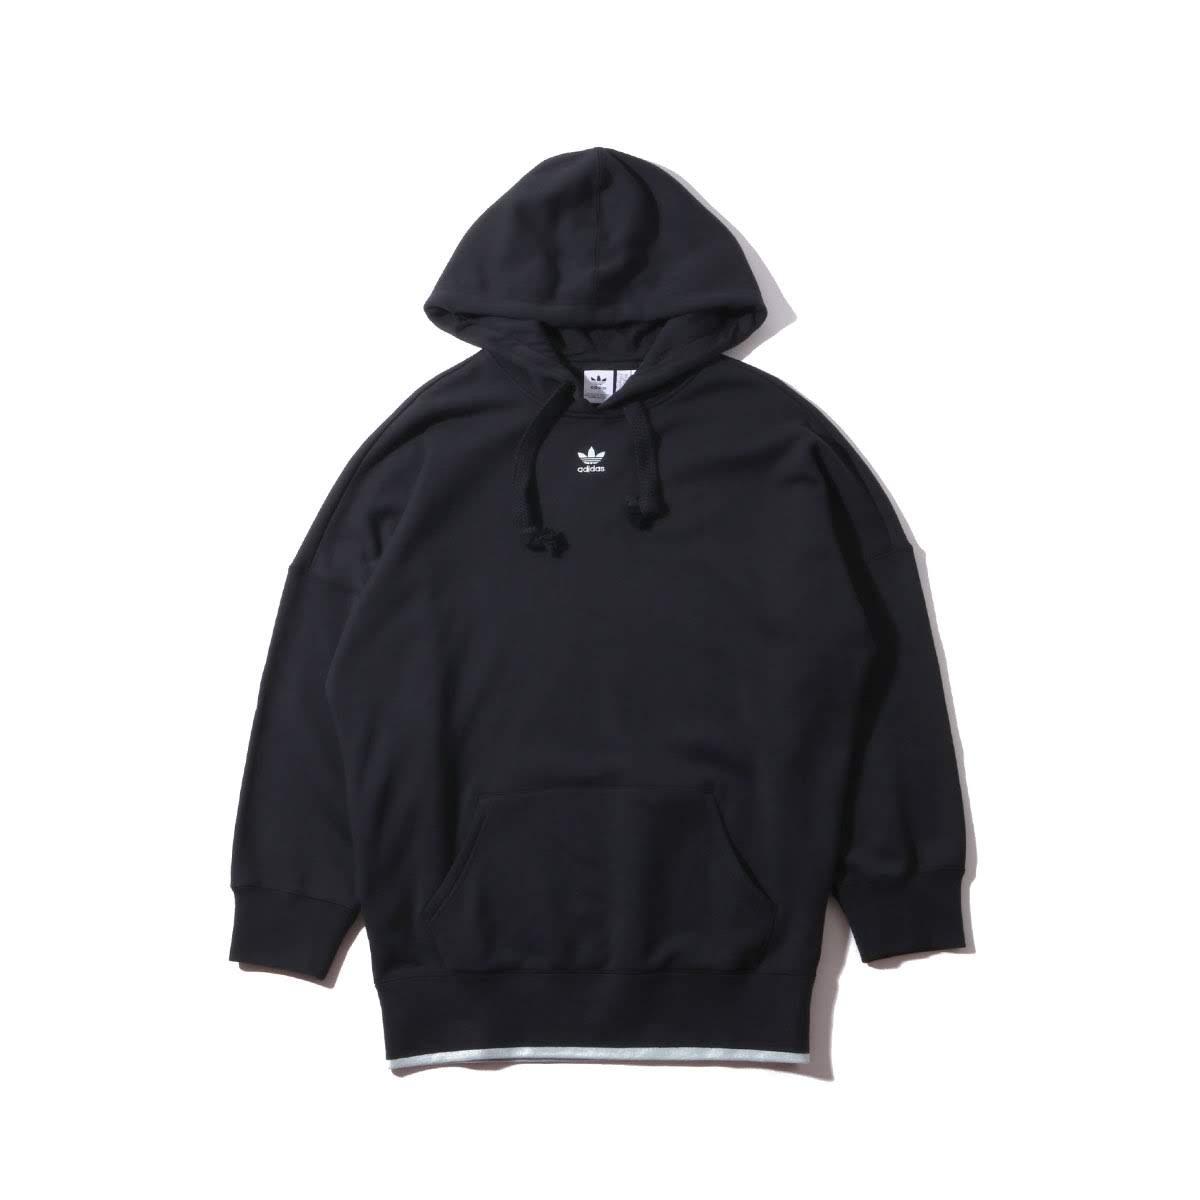 adidas Originals HOODIE(アディダスオリジナルス フーディー)BLACK【レディース パーカー】19SS-I